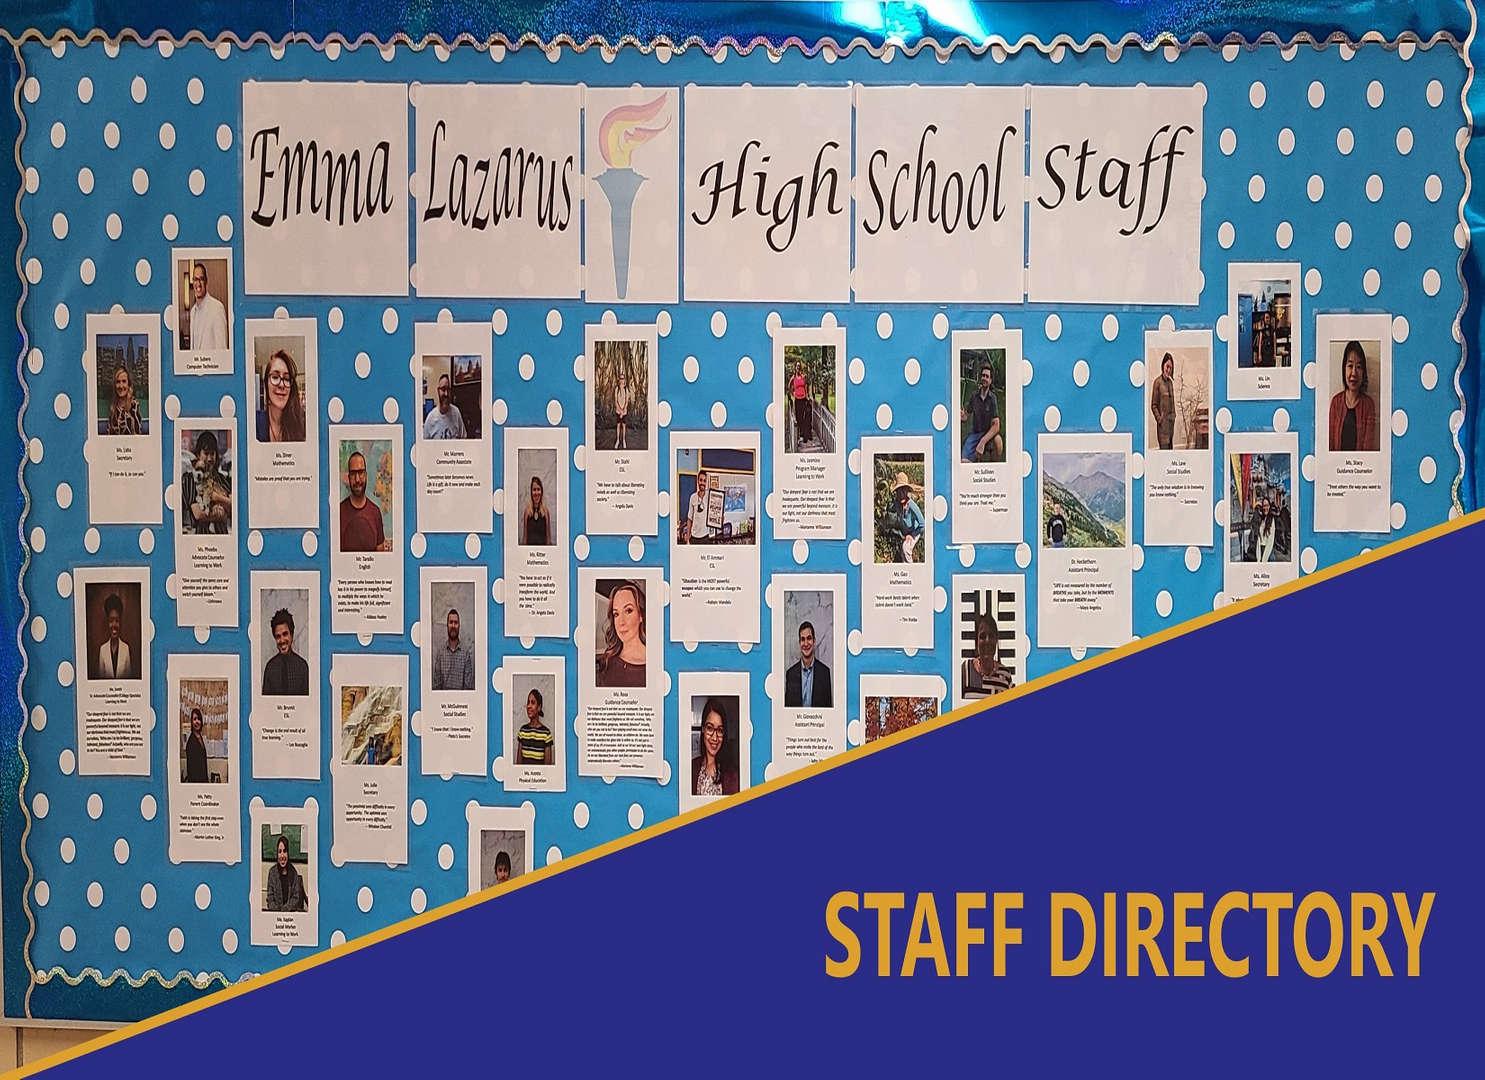 Staff Directory - School staff poster wall